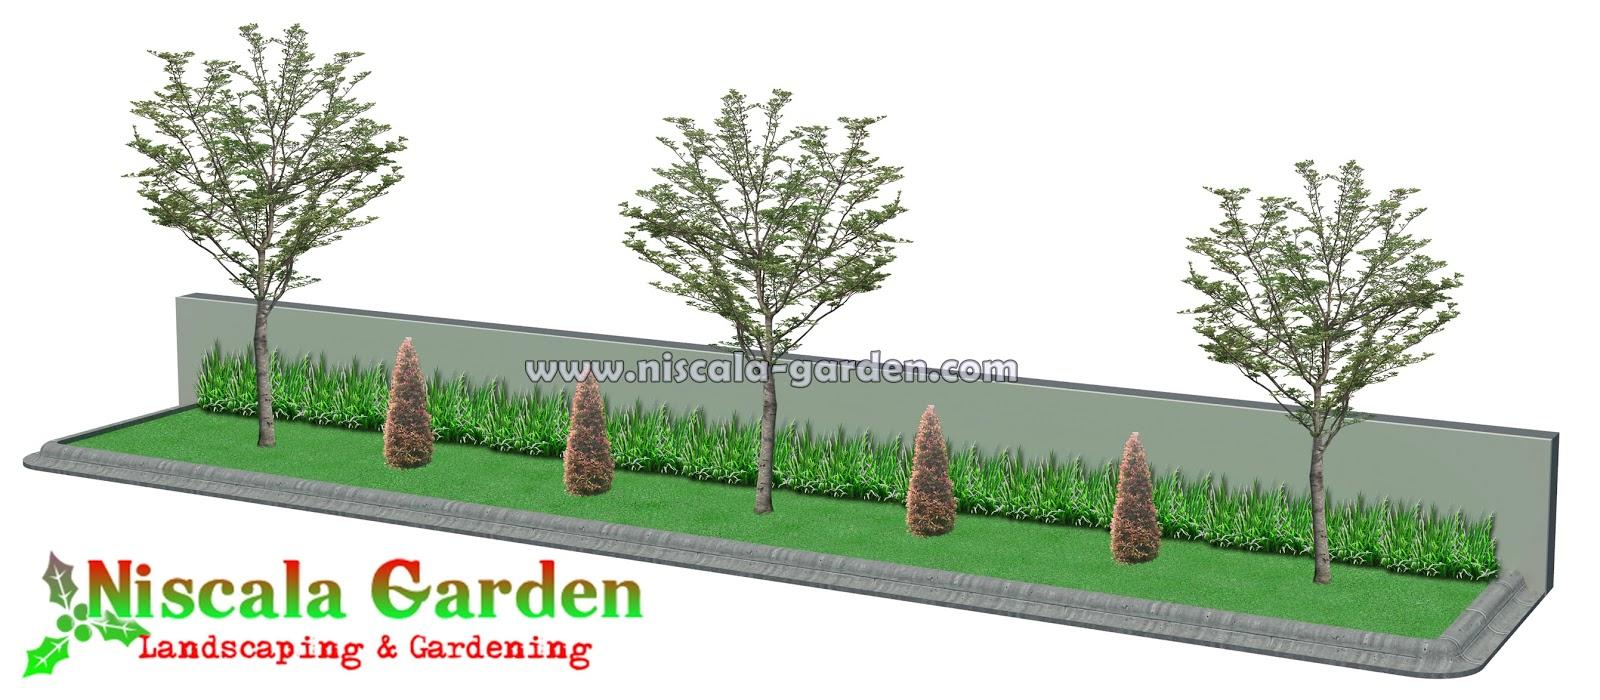 Sketsa 3d Desain Taman Jasa Tukang Taman Surabaya Penata Taman